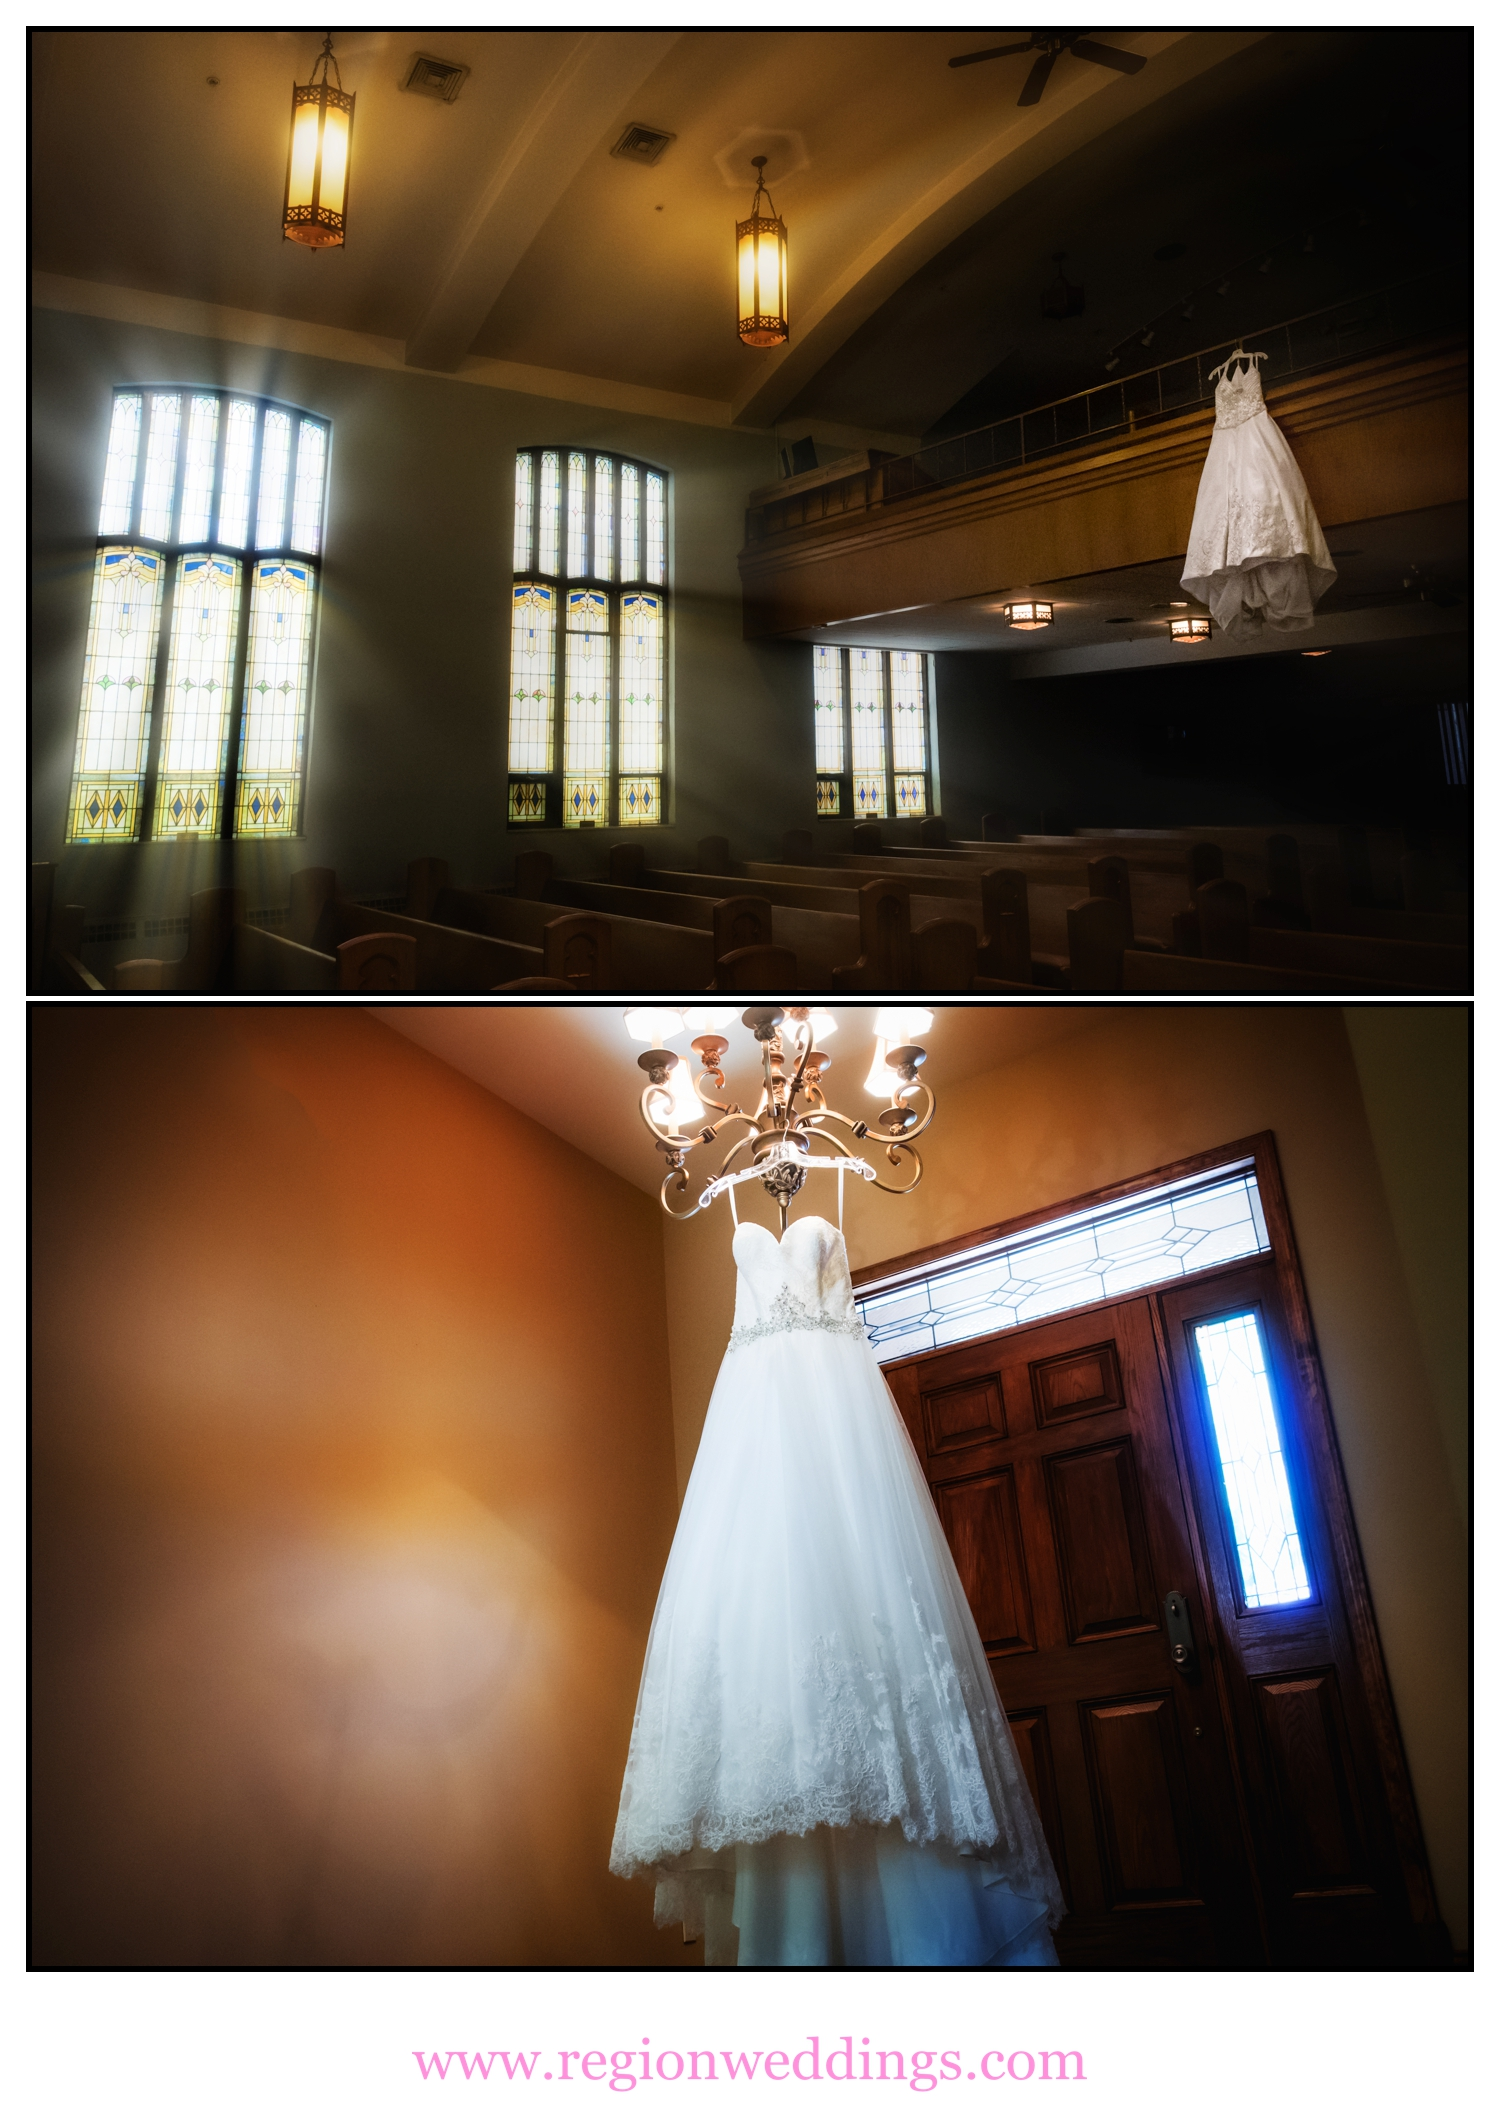 Wedding dress photo collage.